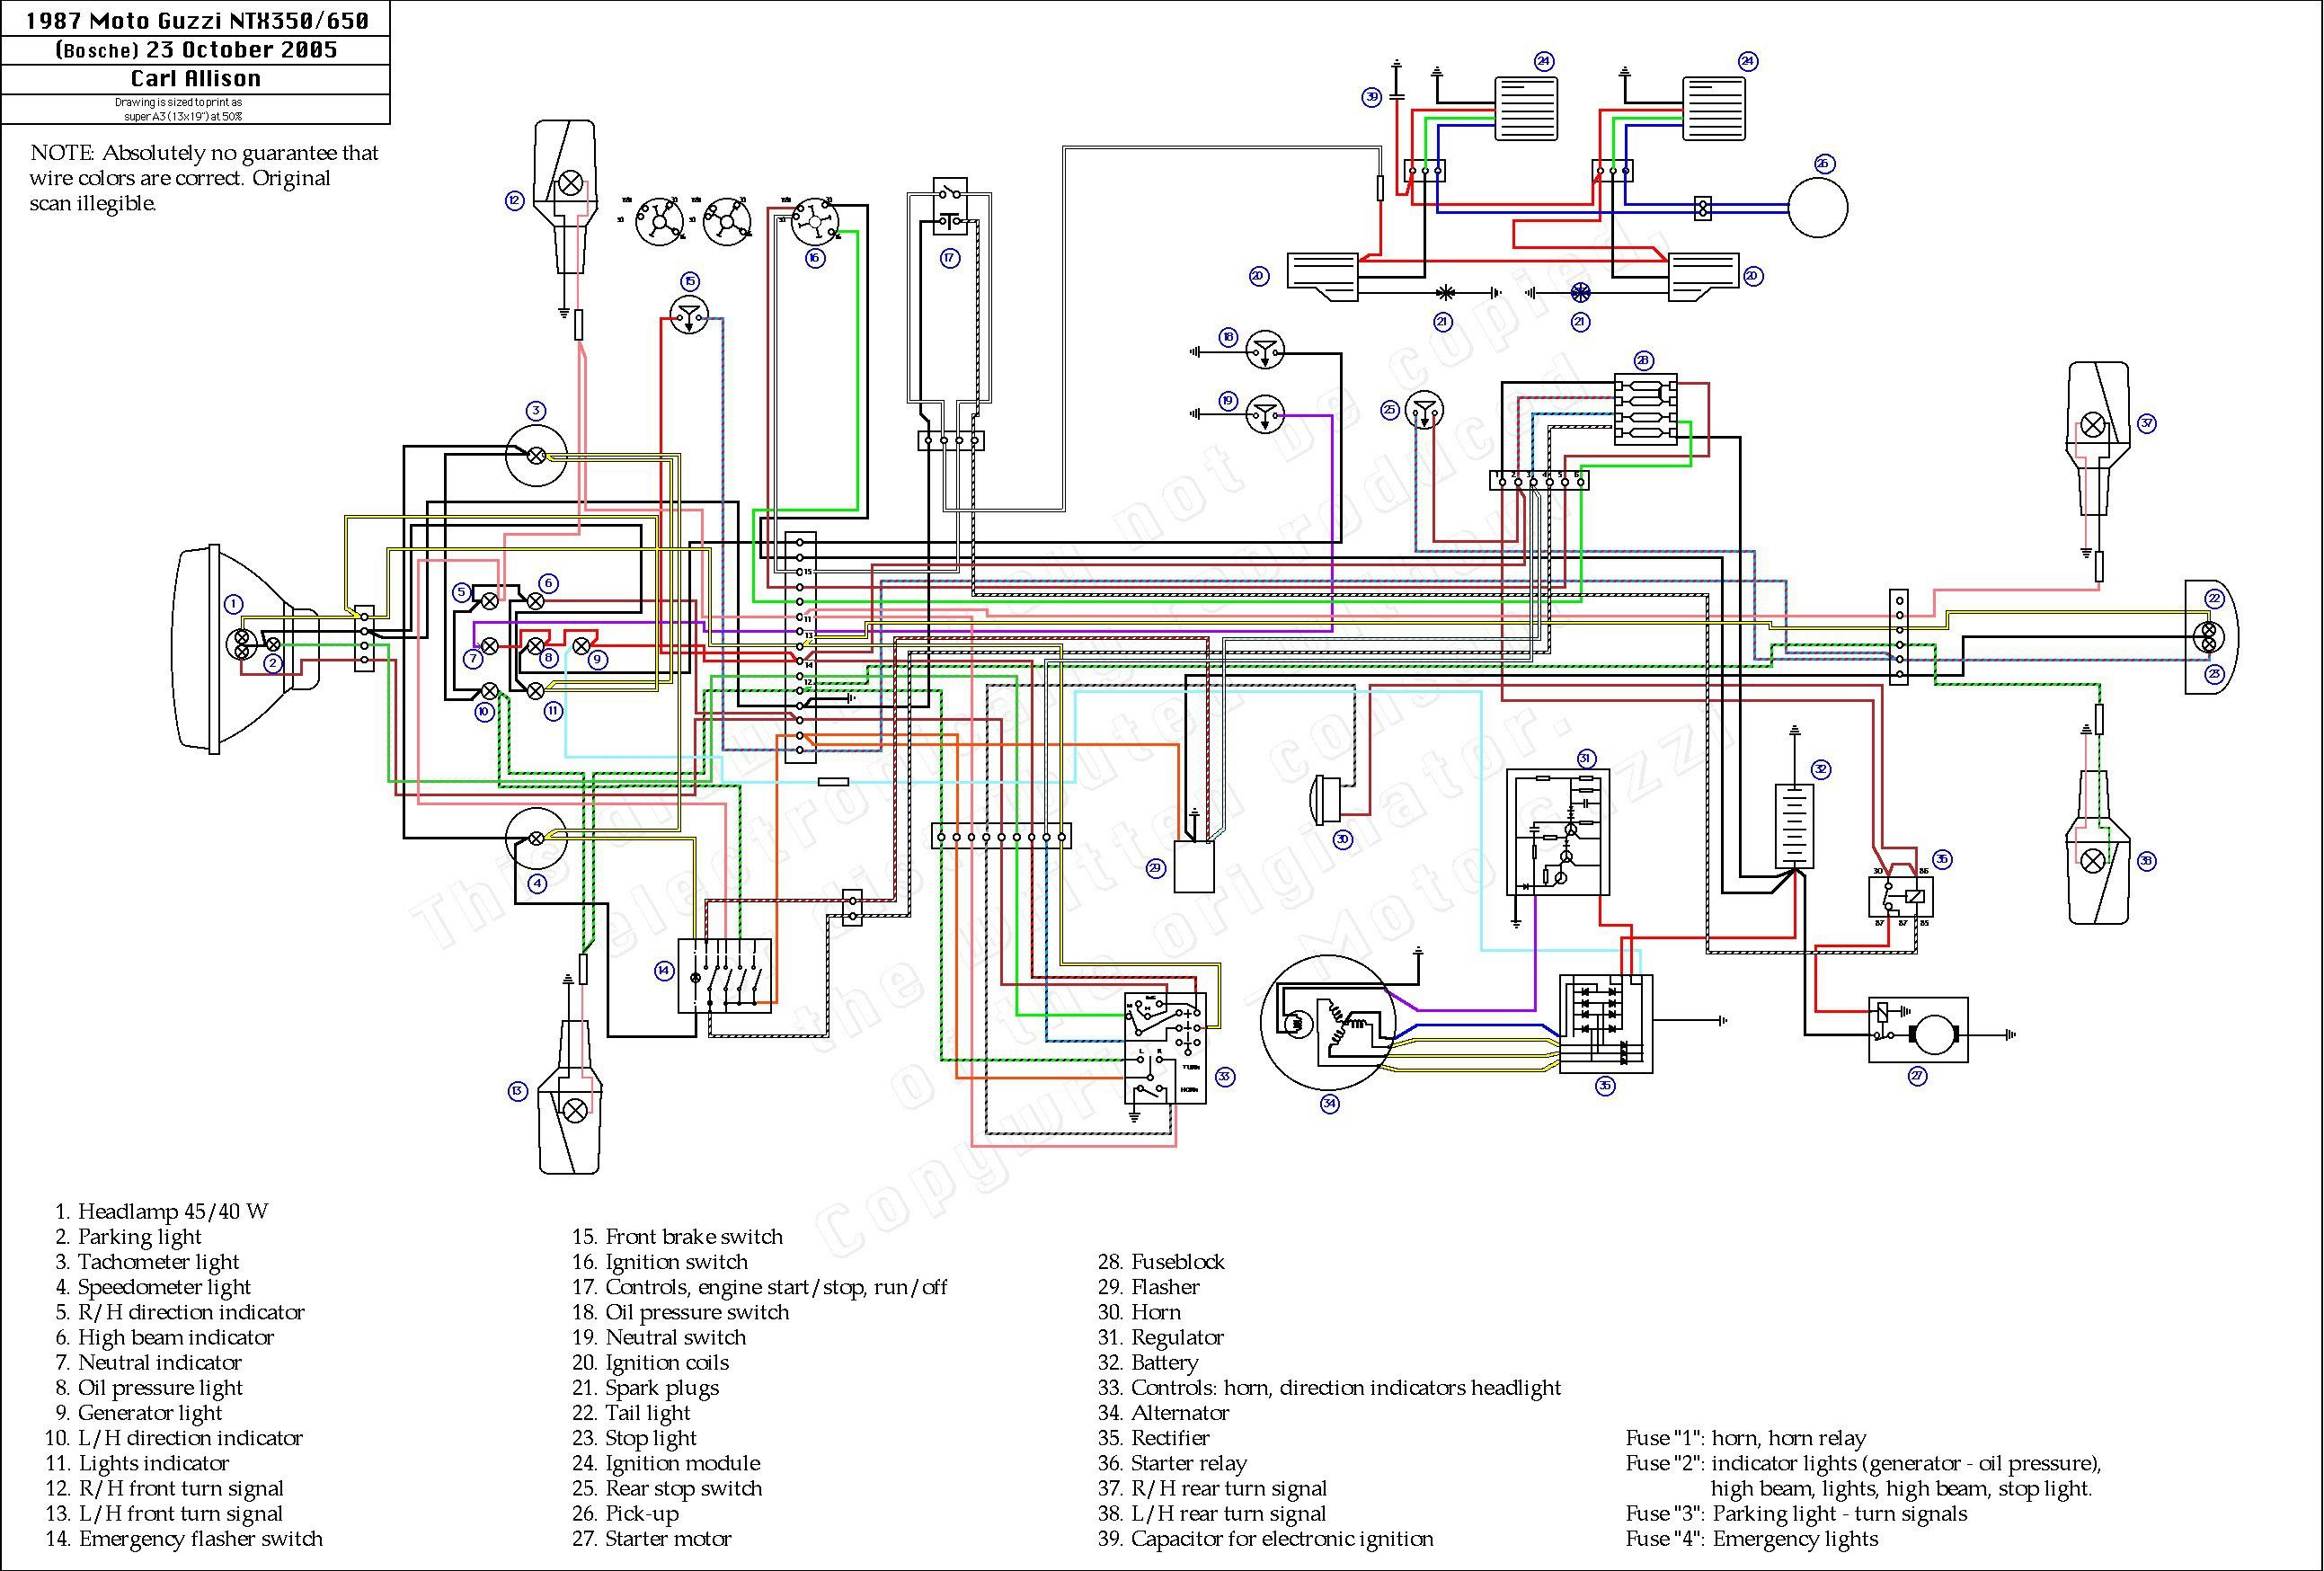 Outstanding Chinese Atv Wiring Diagram Wirings Diagram Wiring 101 Cominwise Assnl